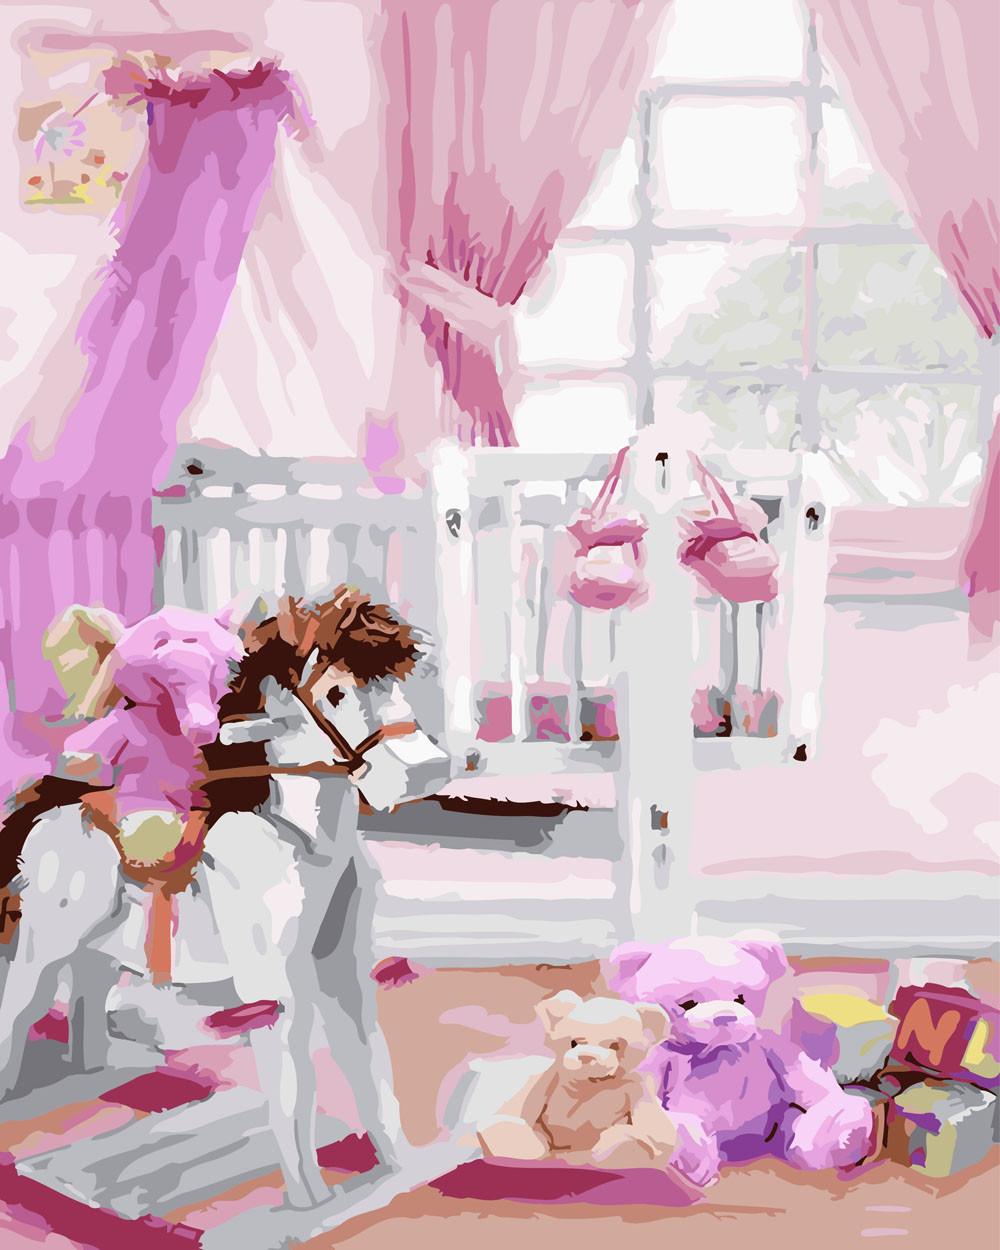 Картина по номерам Детская комната, 40x50 см., Rainbow art